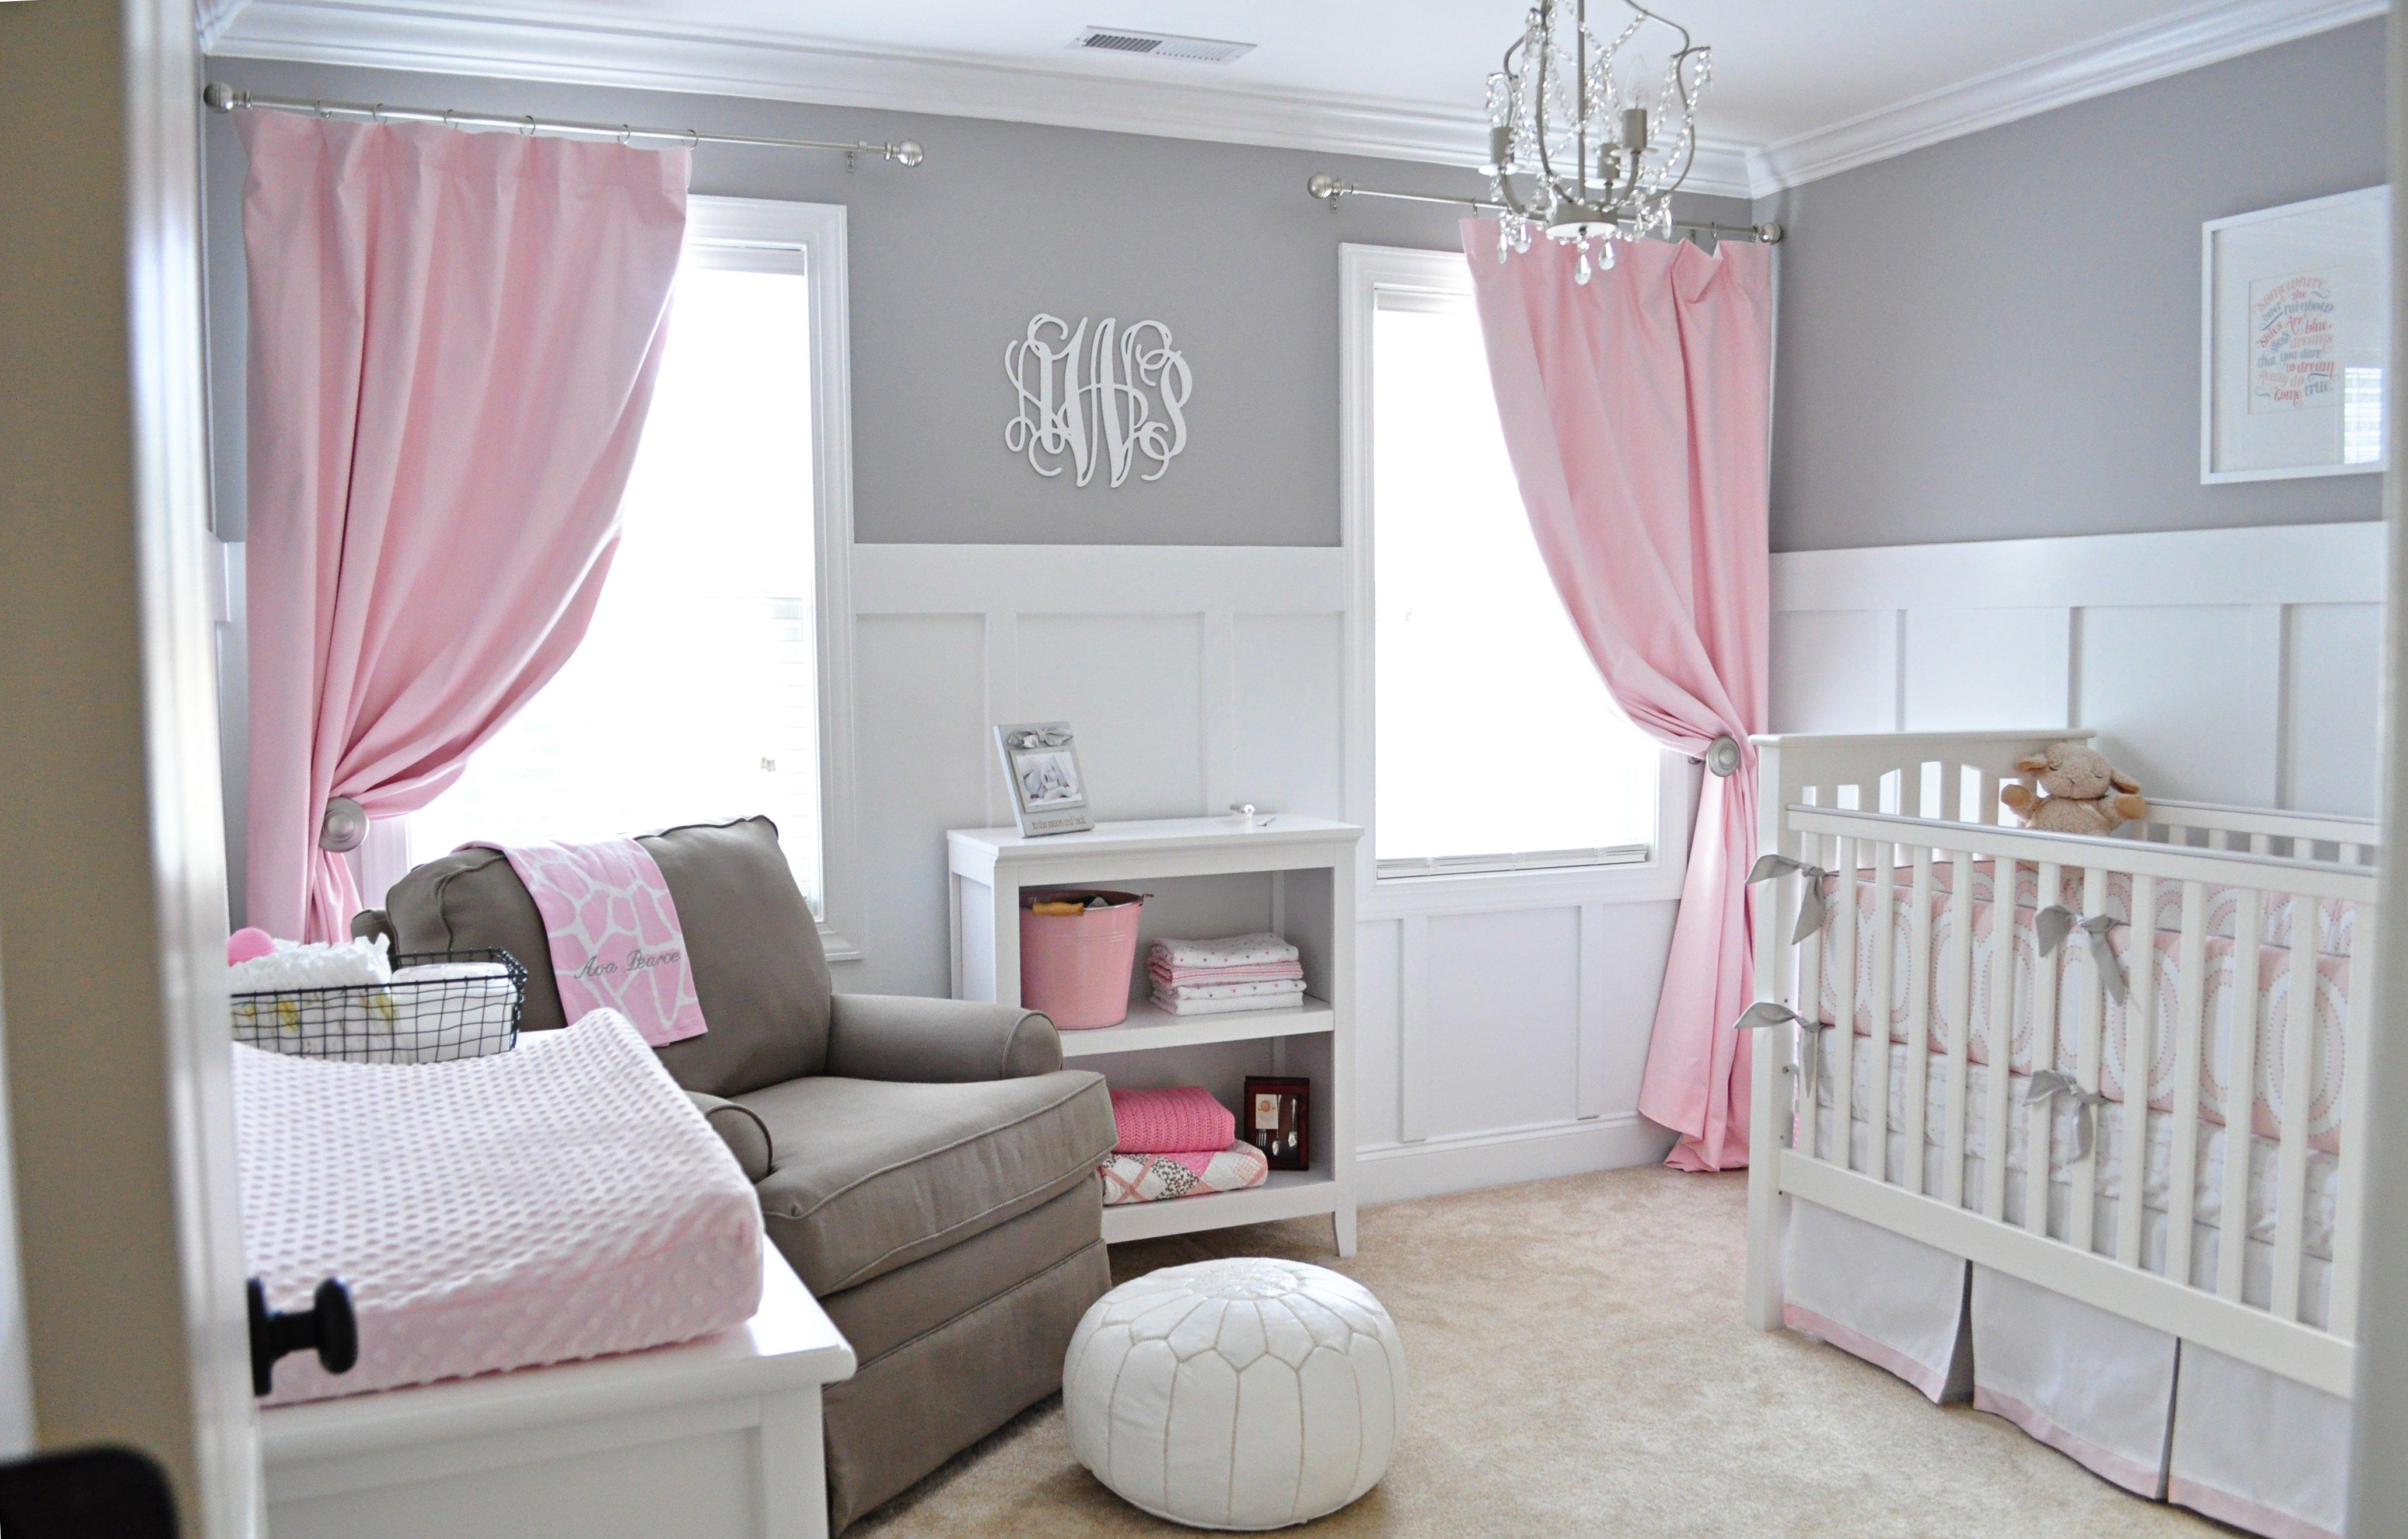 10 Ideal Pink And Grey Nursery Ideas avas sweet gray and pink nursery project idolza 2021